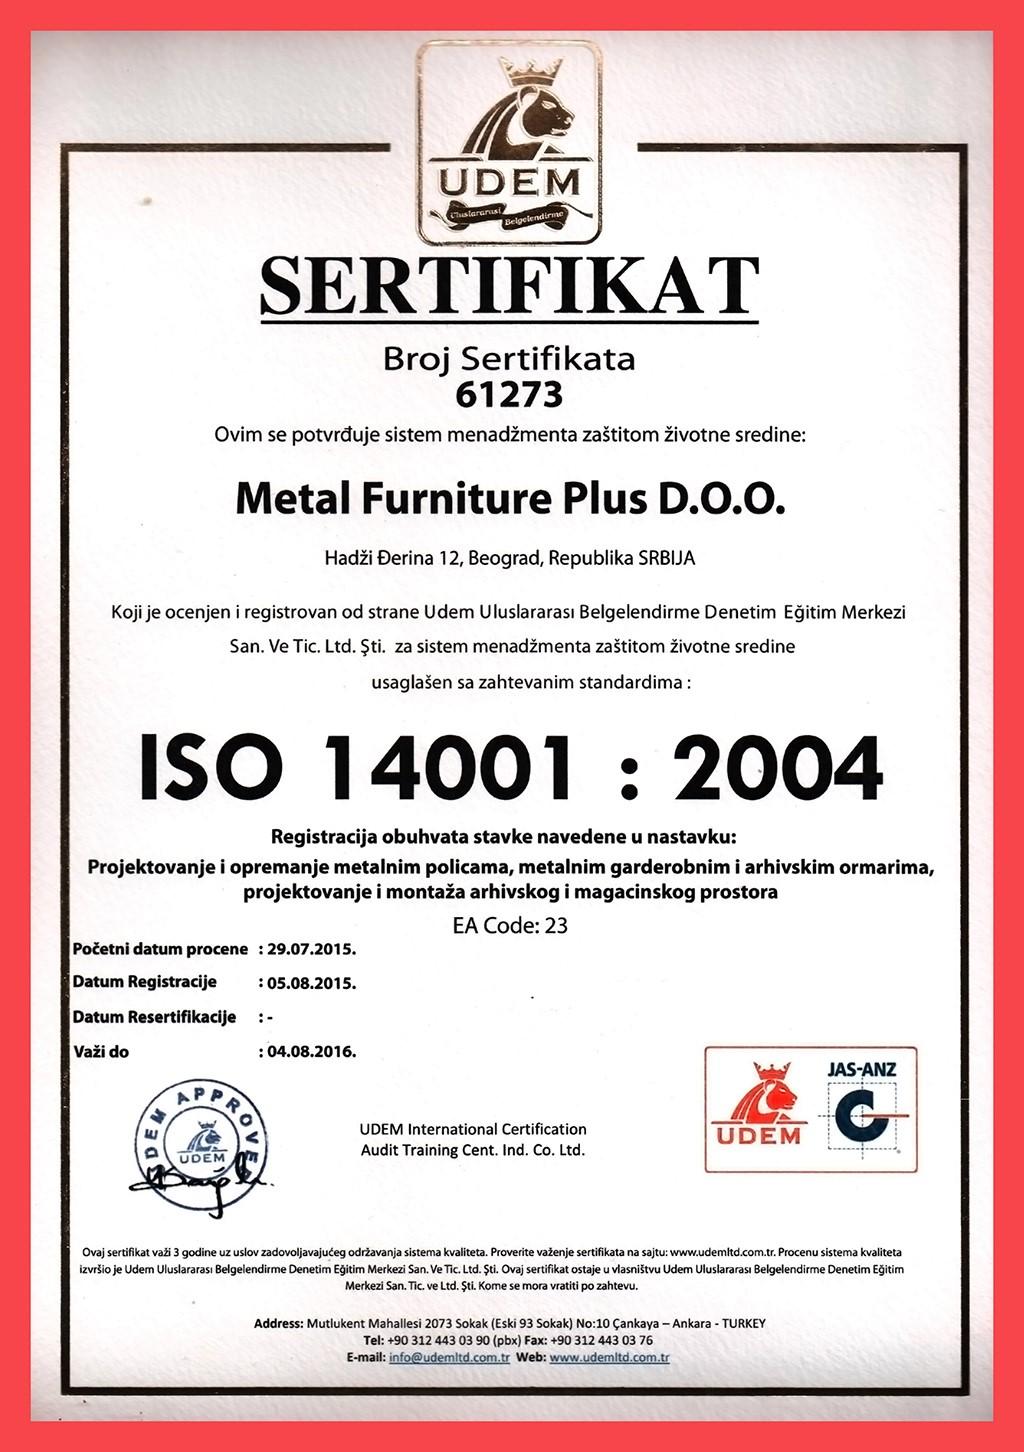 Sertifikat ISO - 14001 : 2004